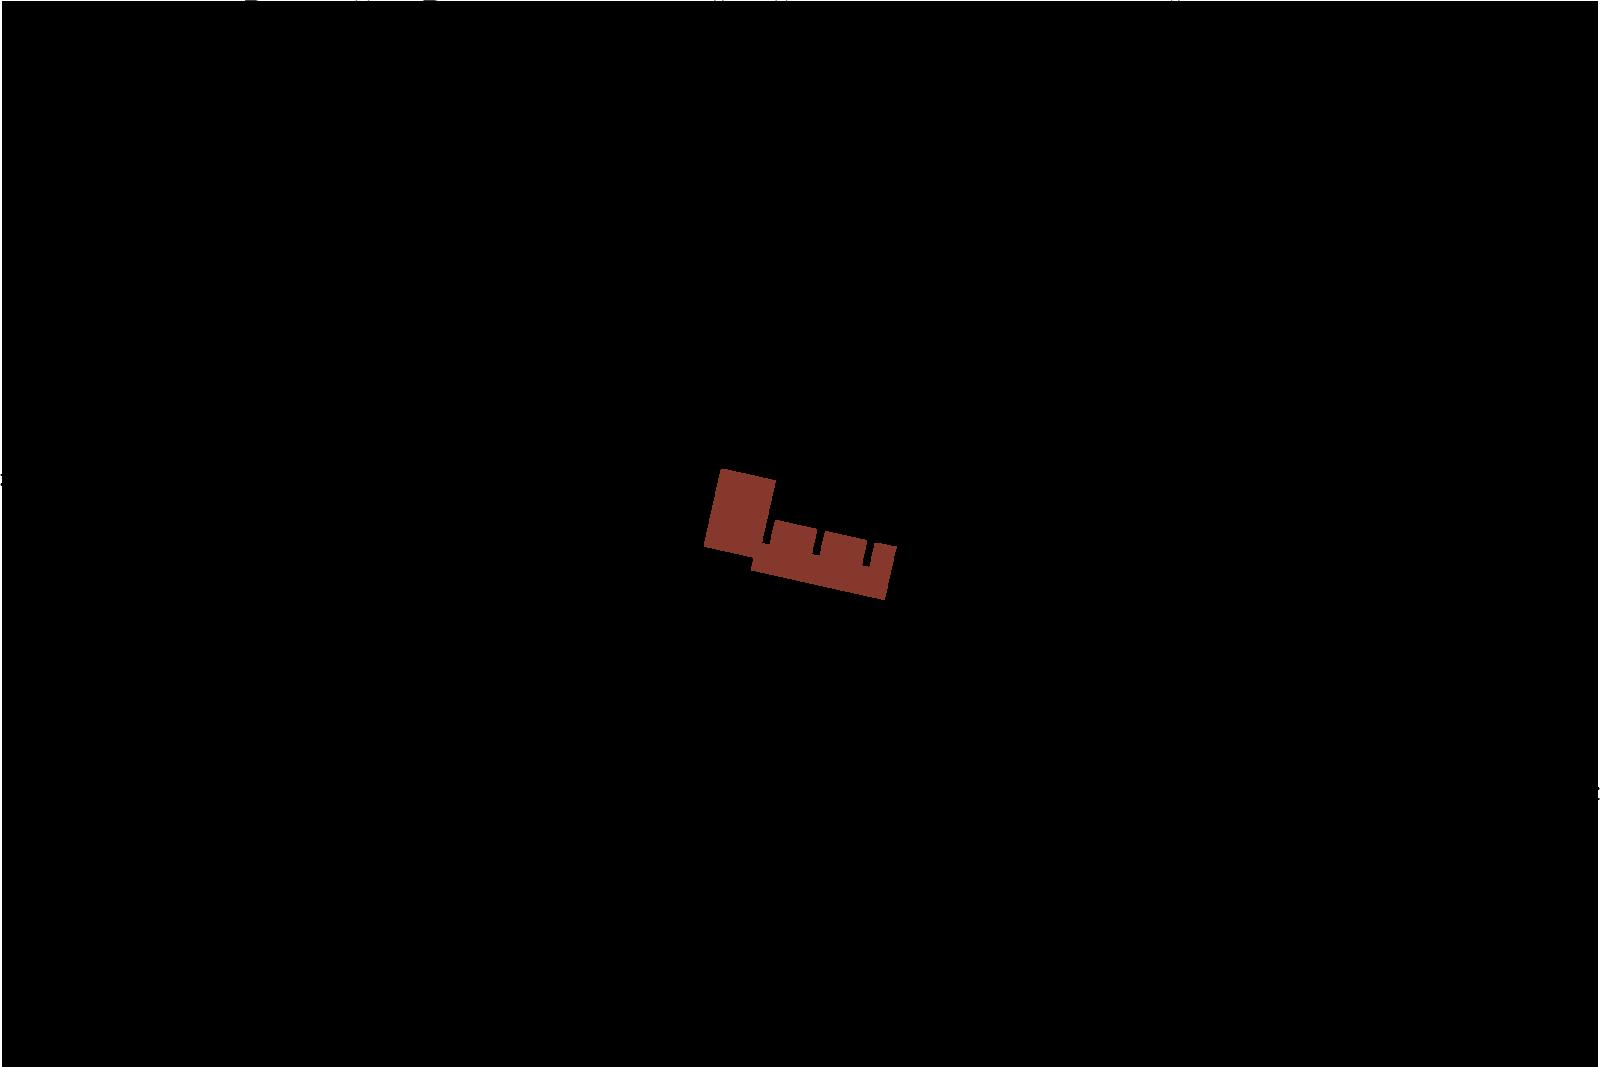 C01_05